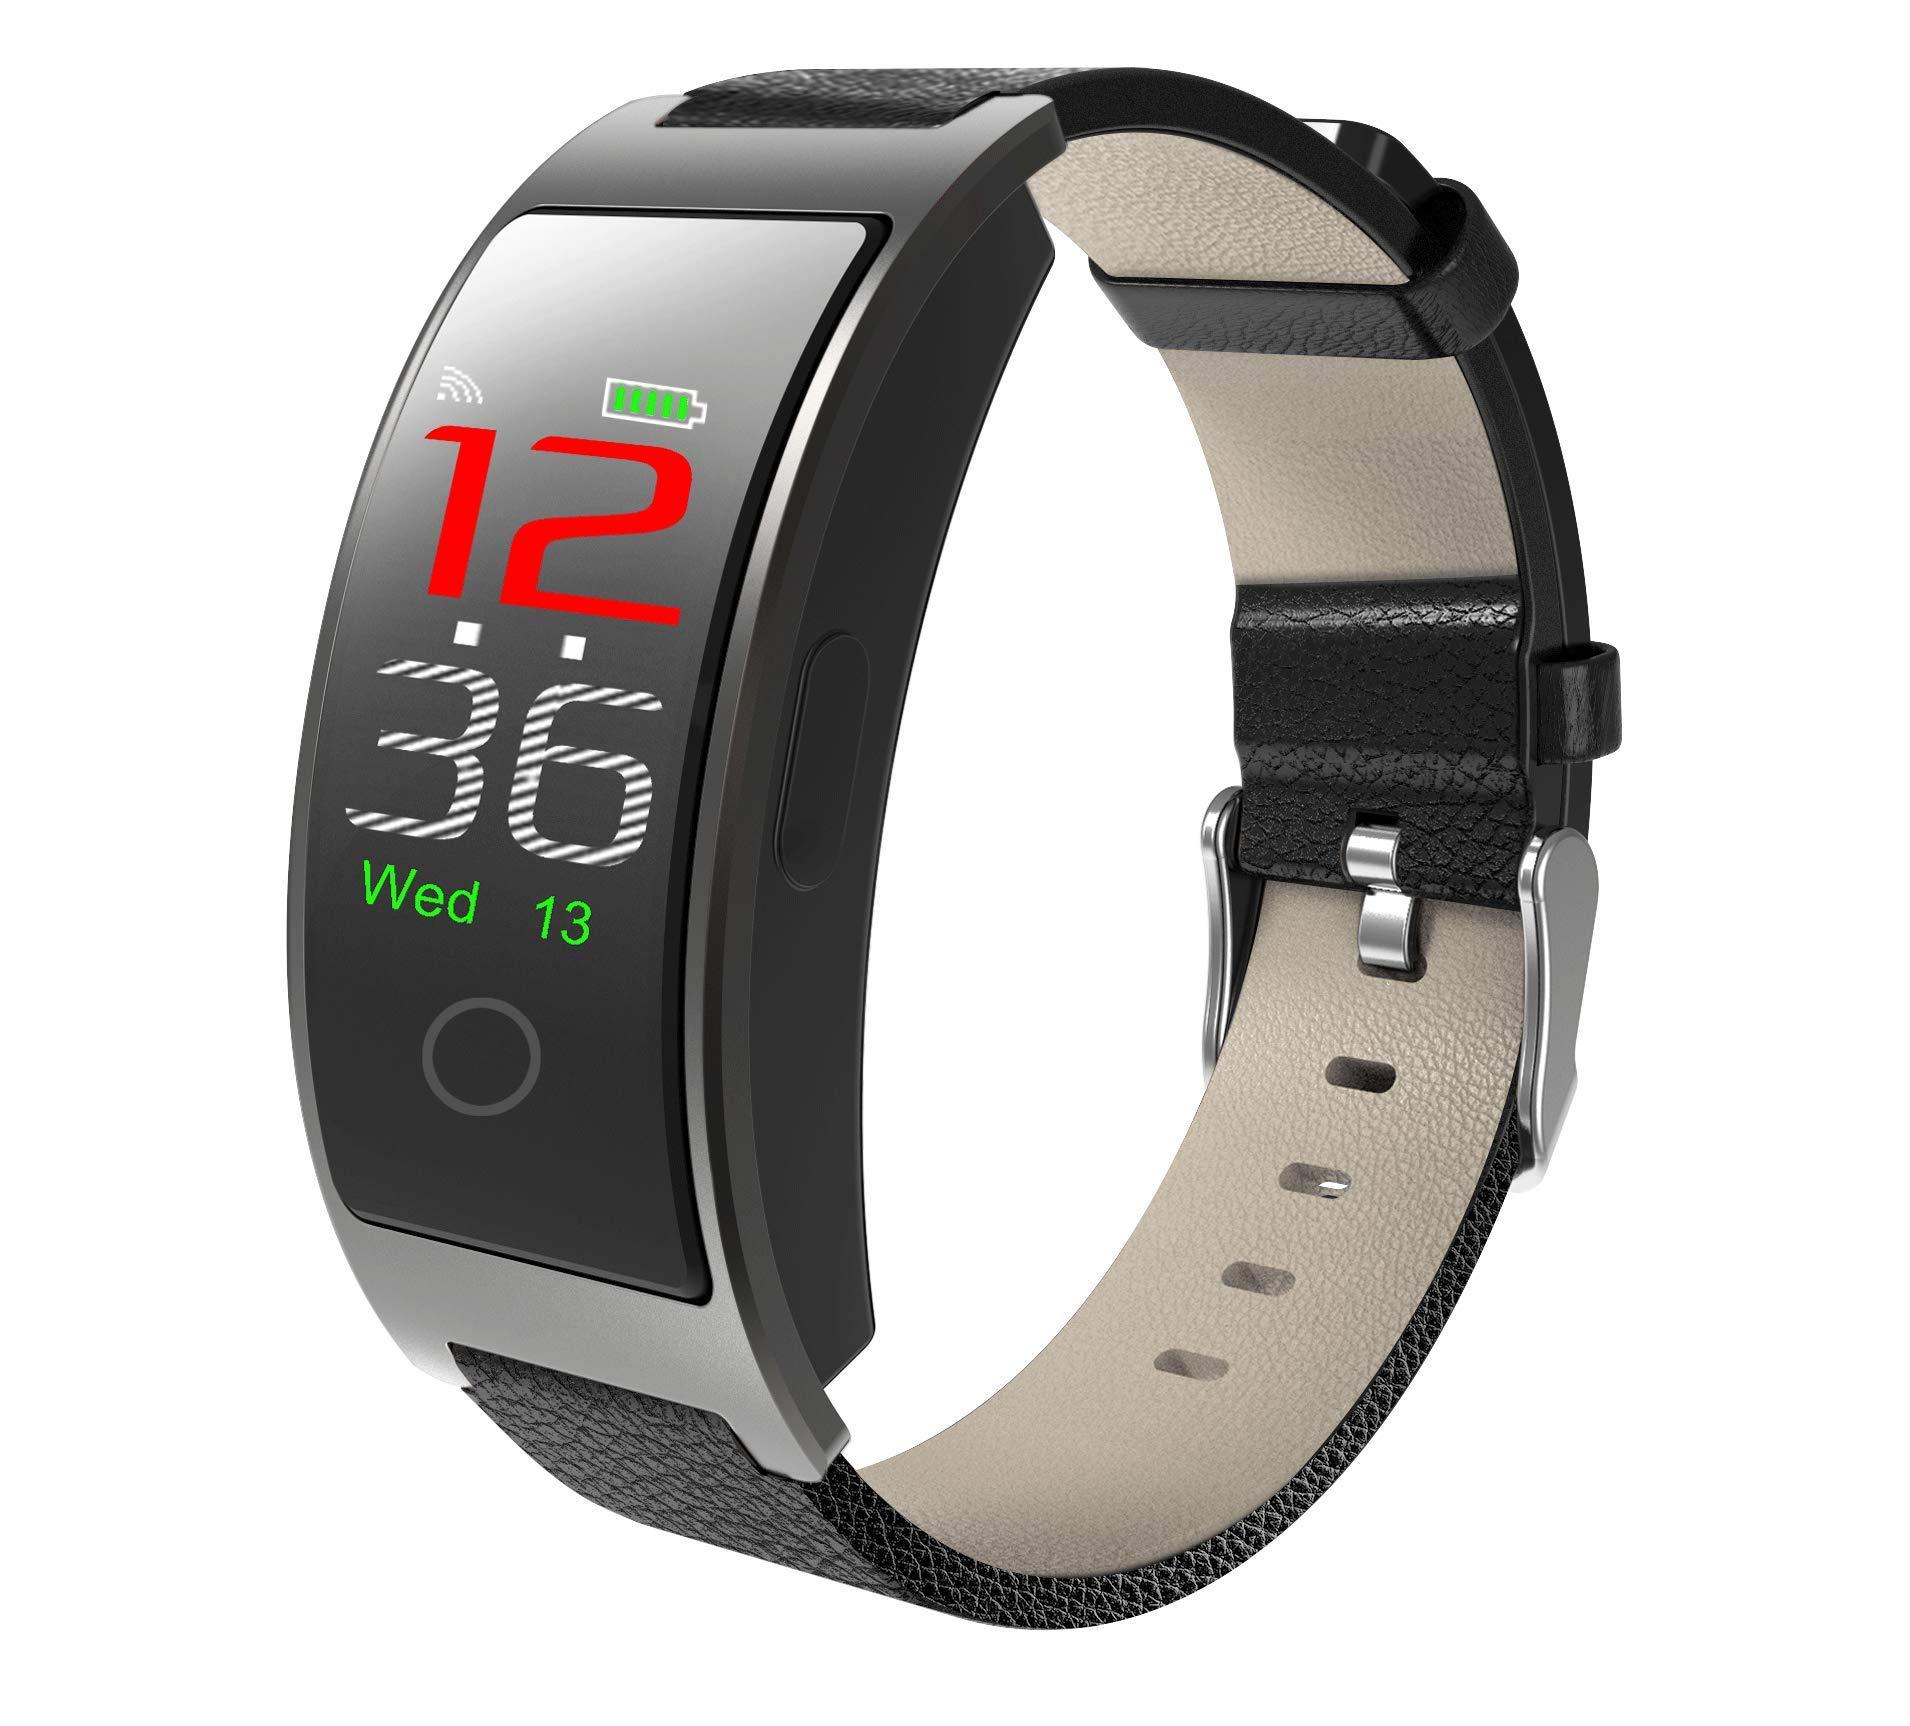 SPORS Fitness Tracker cinturón Impermeable Ritmo cardíaco presión Arterial sueño Monitor podómetro Reloj Inteligente… 2